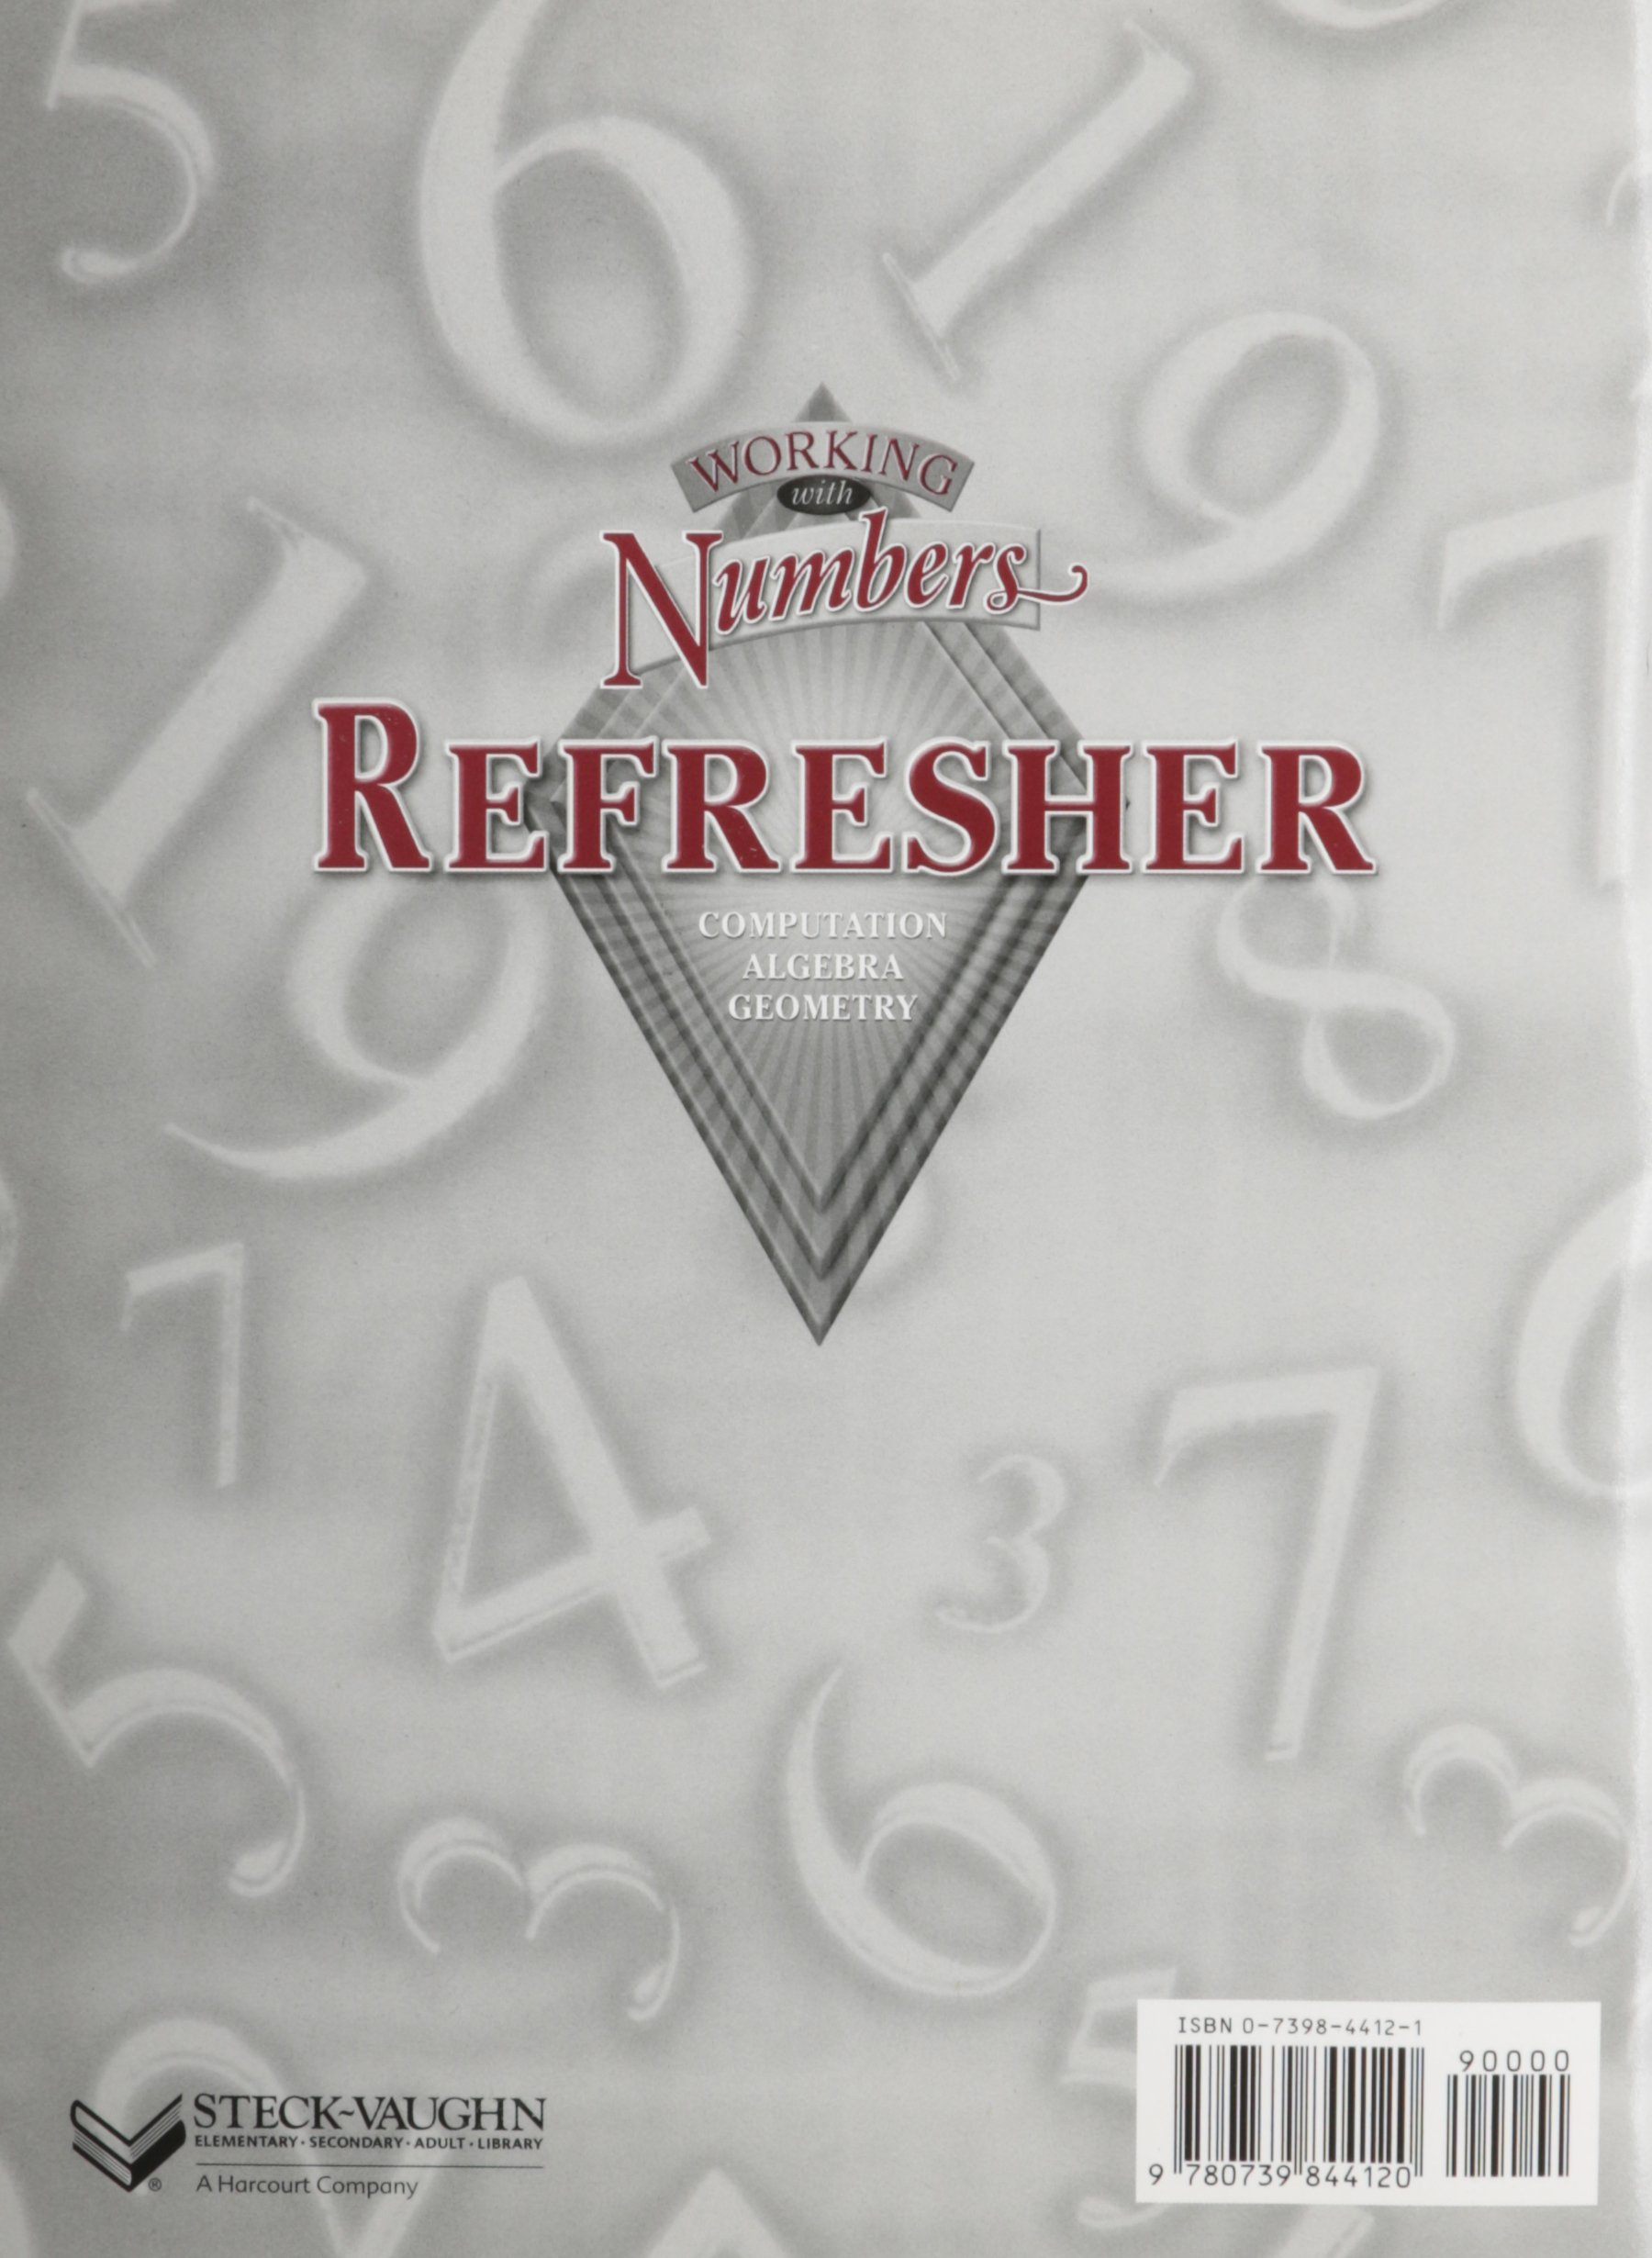 Amazon.com: Working With Numbers Refresher: Computation, Algebra ...